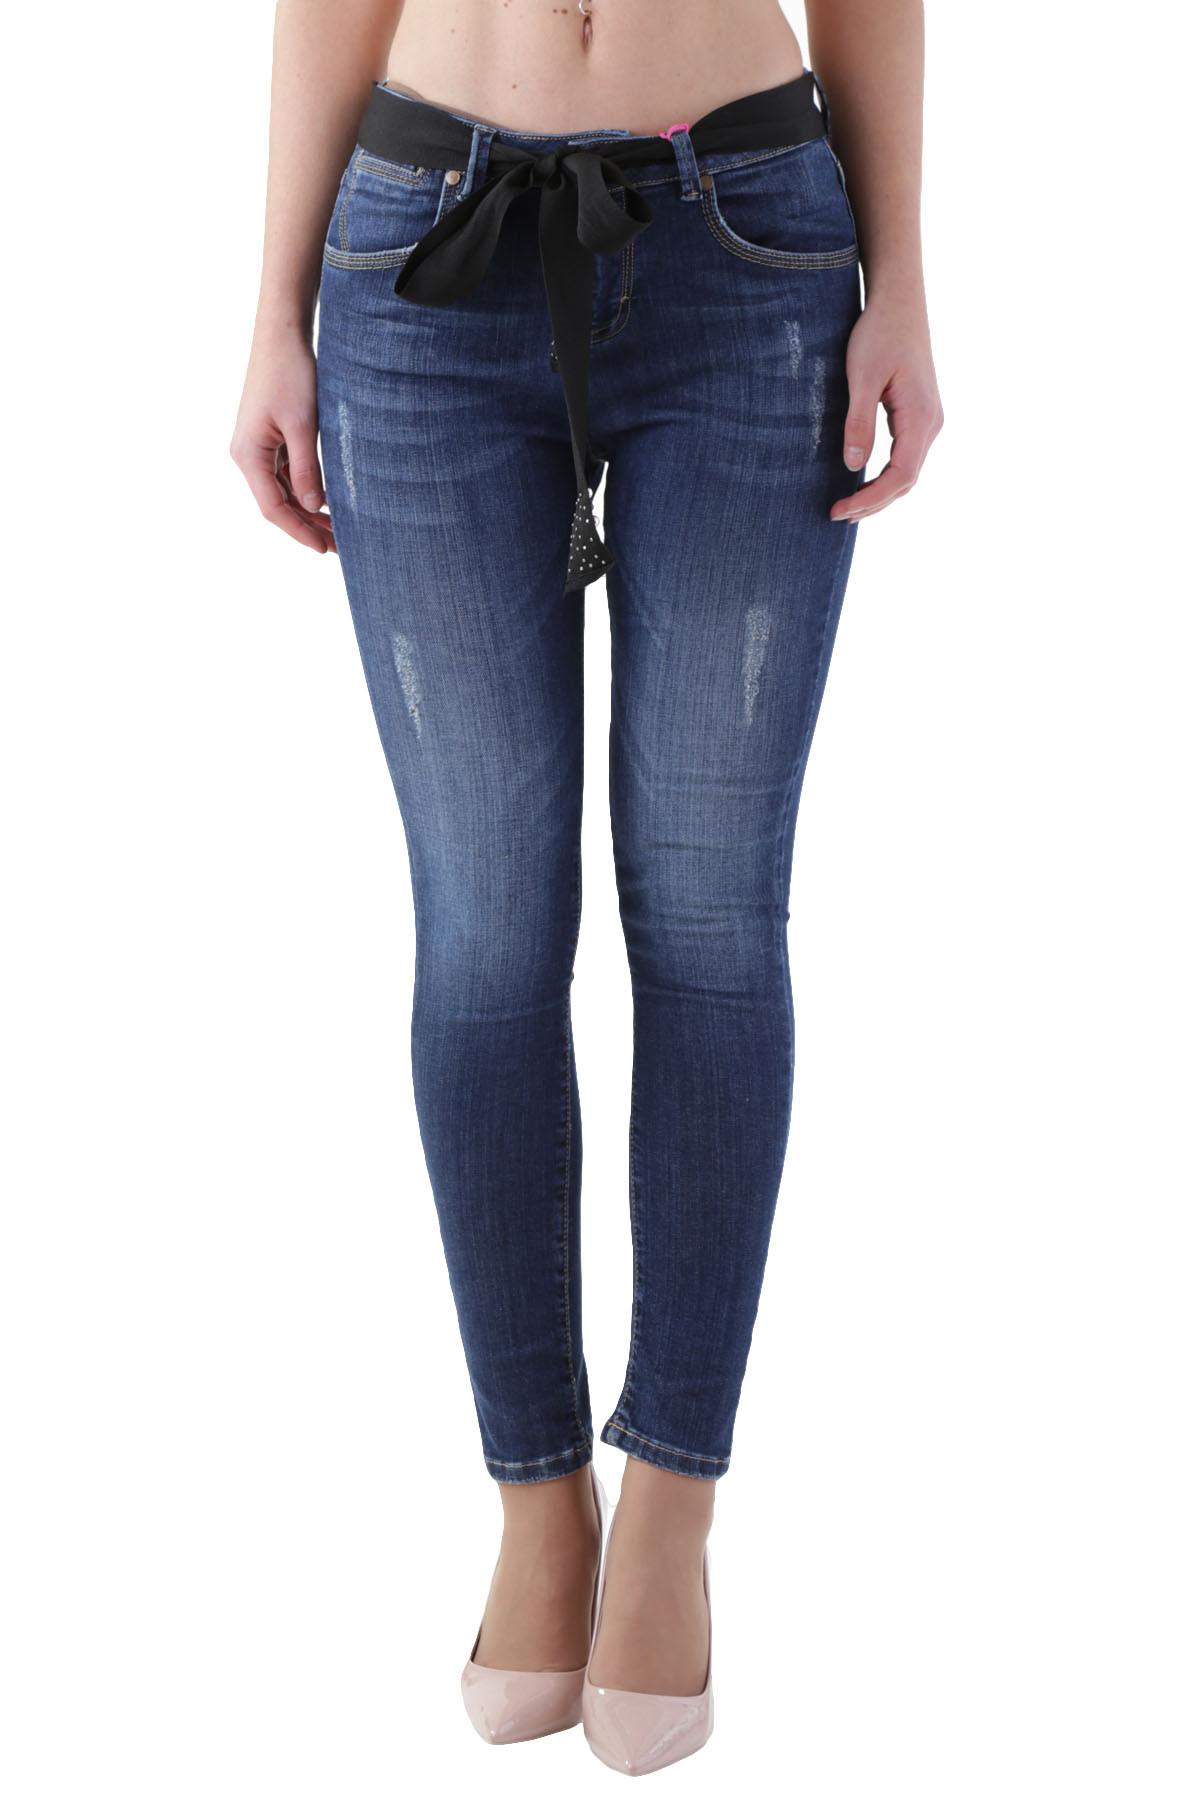 24eee6756aee GR 104480 Italy blu Cristina Gavioli Jeans Donna - Sped. in 24 48 ore  lavorative